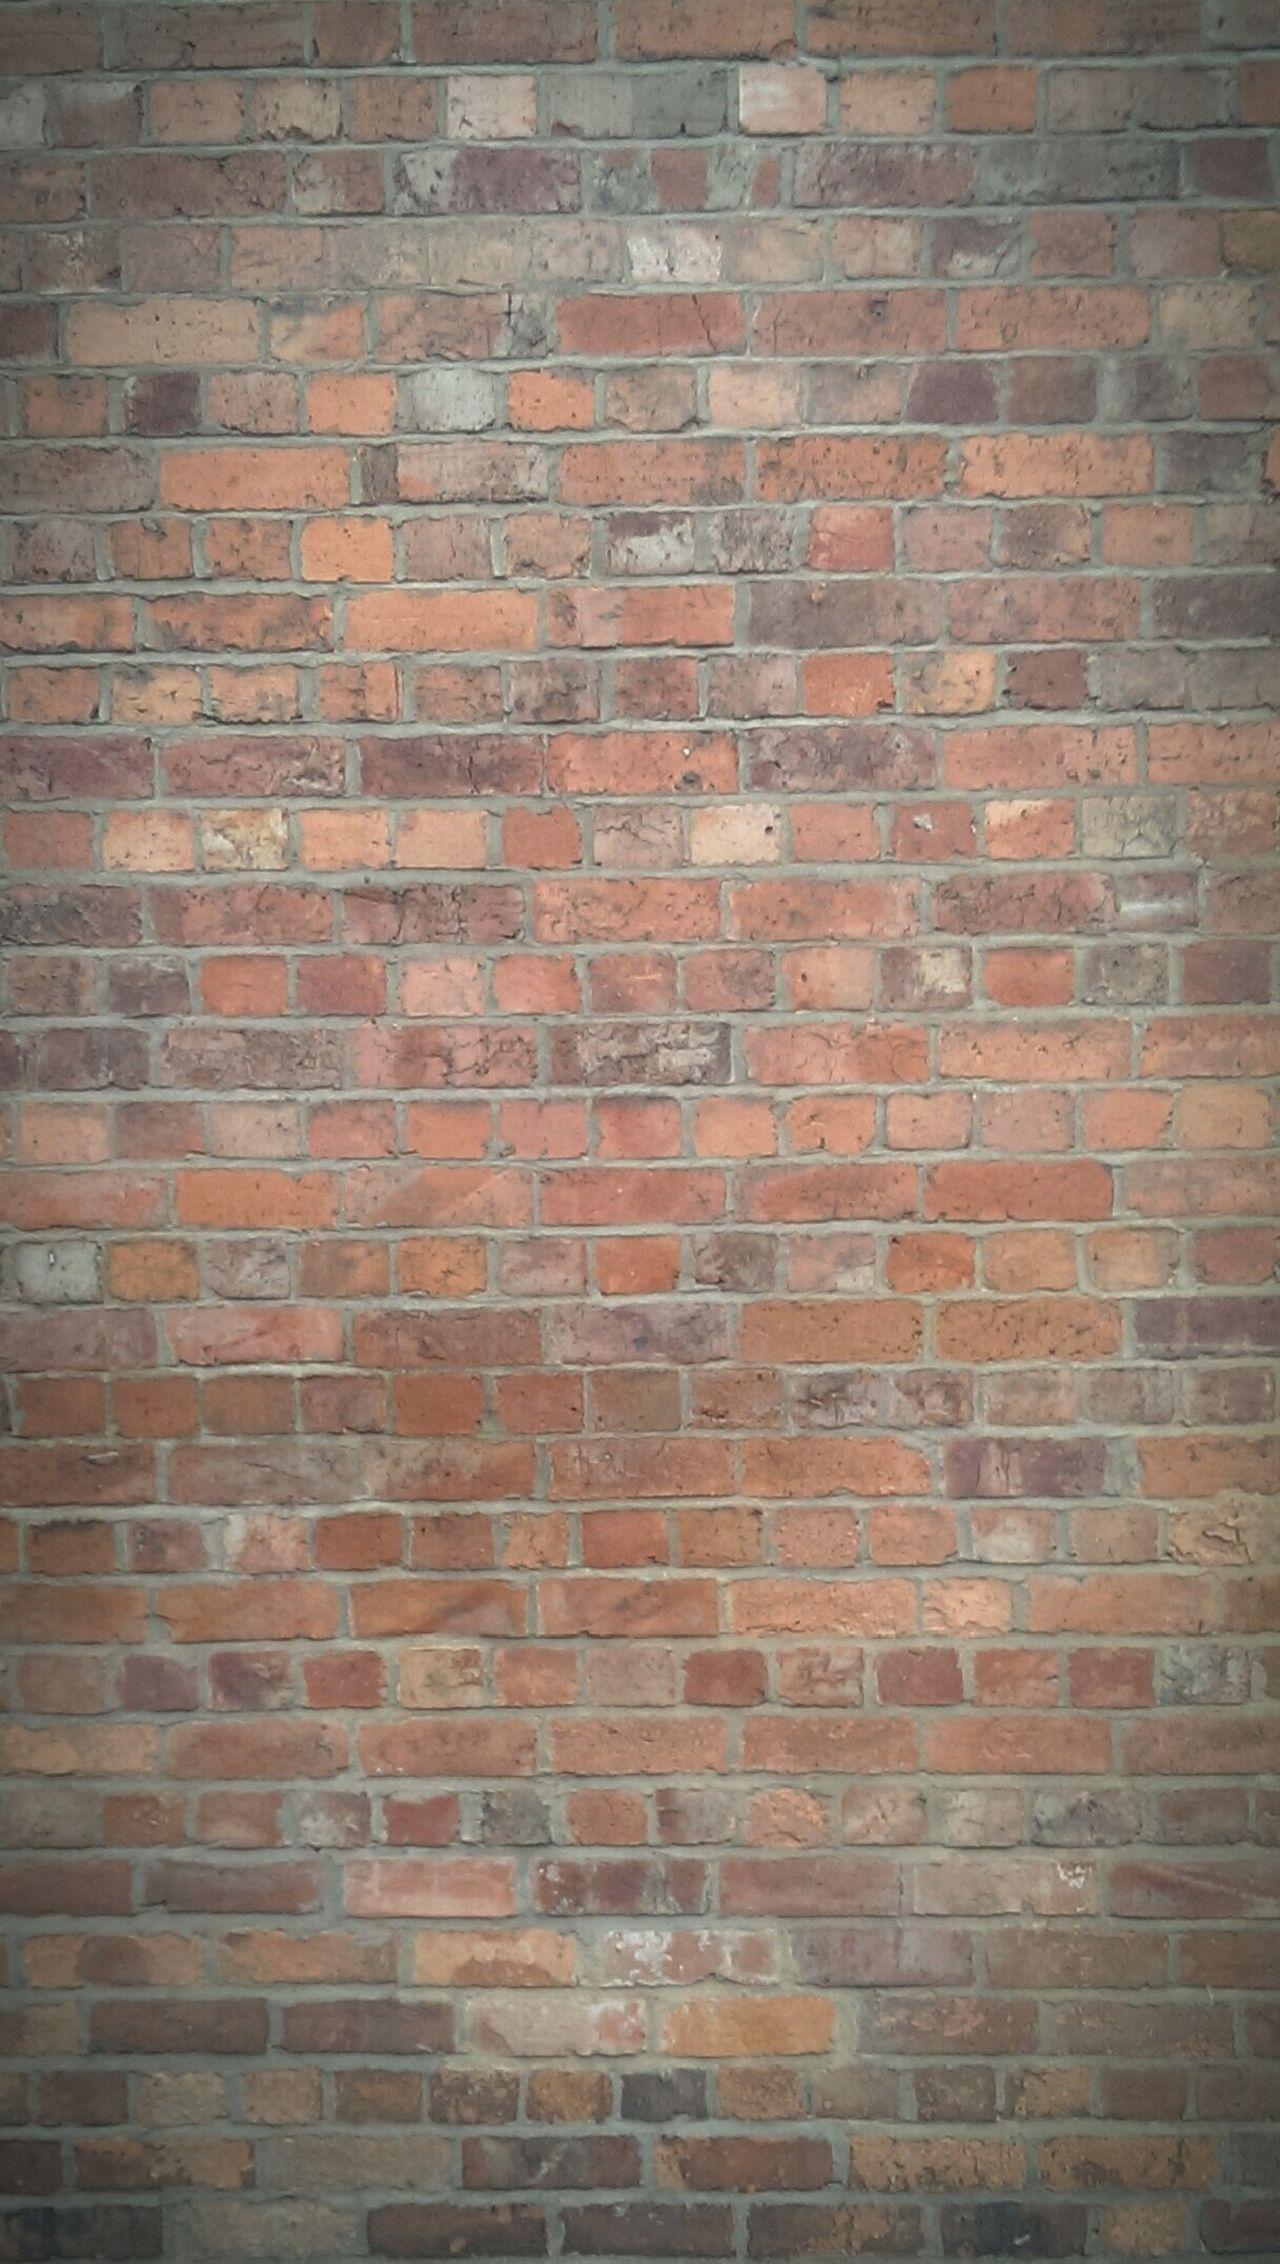 Pastel Power 🏫 Mortar 🏤  Northampton Town Centre Brick Work Bricks Multiple Color